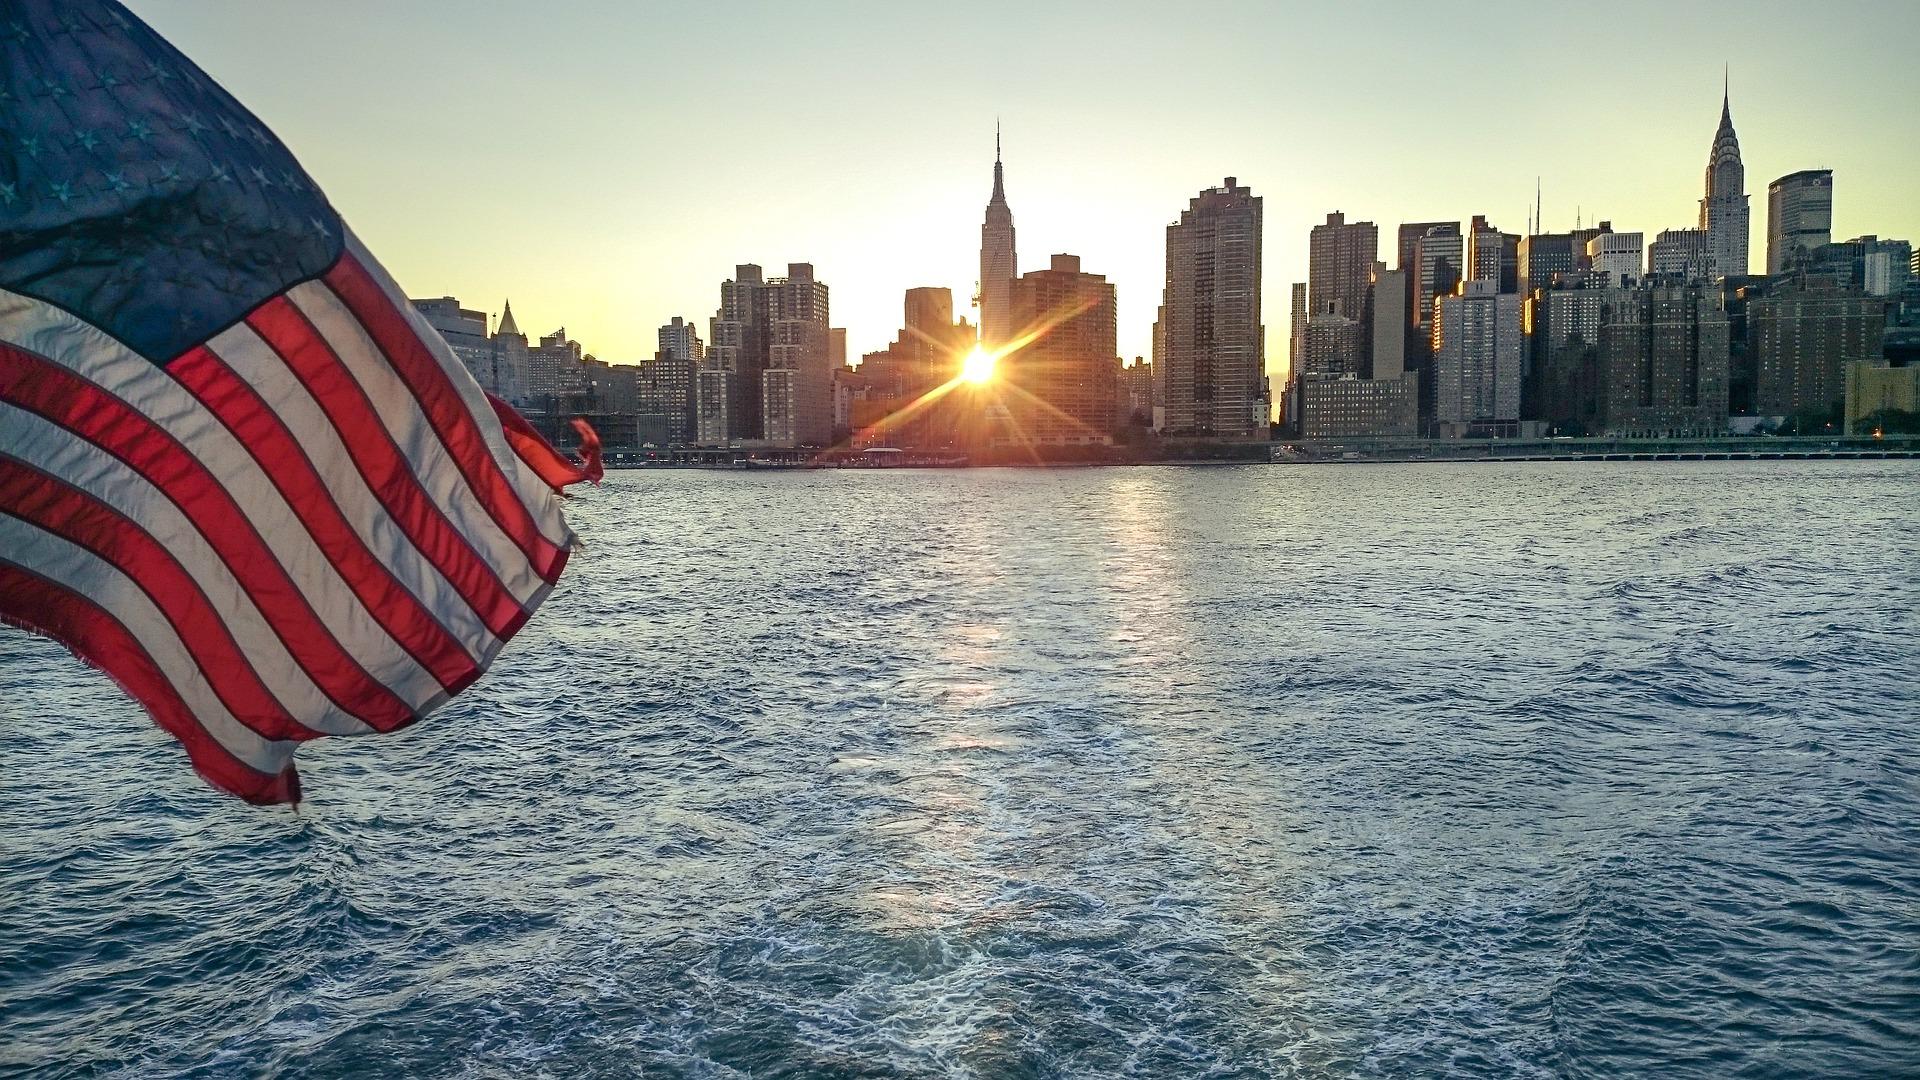 new york 5939704 1920 - Un voyage original entre amis : New York hors des sentiers battus